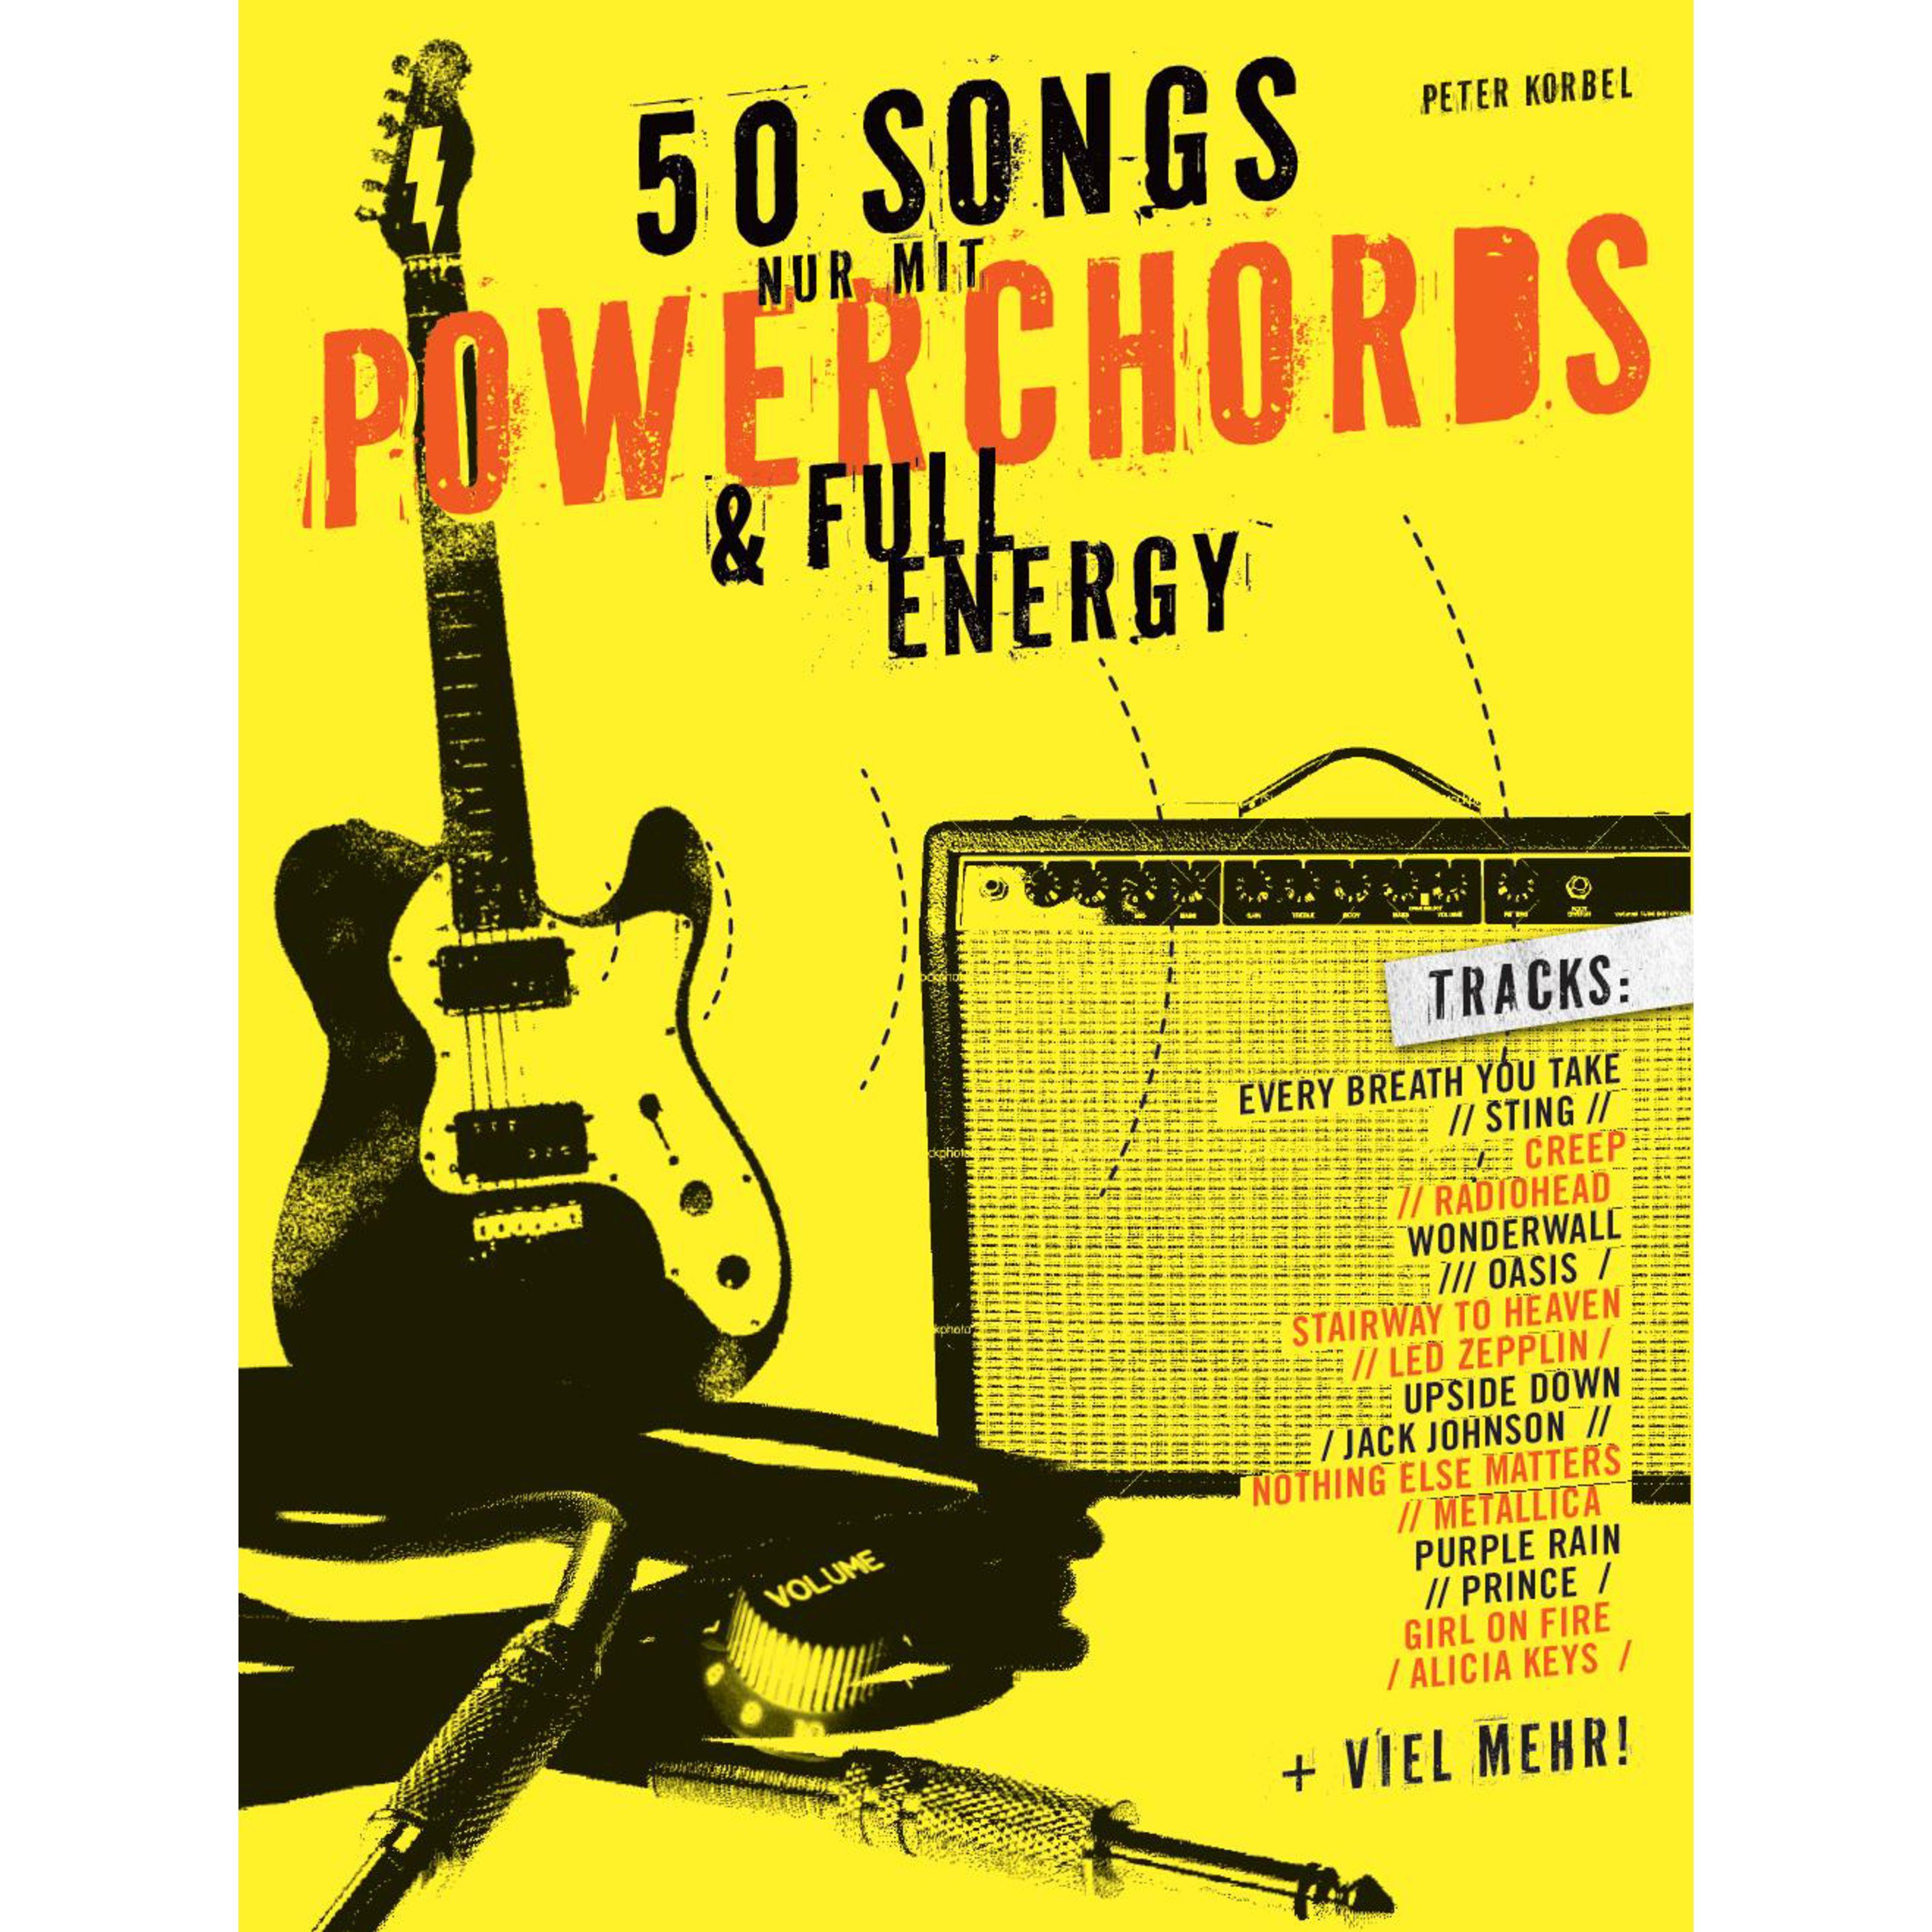 Bosworth Music - 50 Songs nur mit Powerchords & Full Energy BOE7708